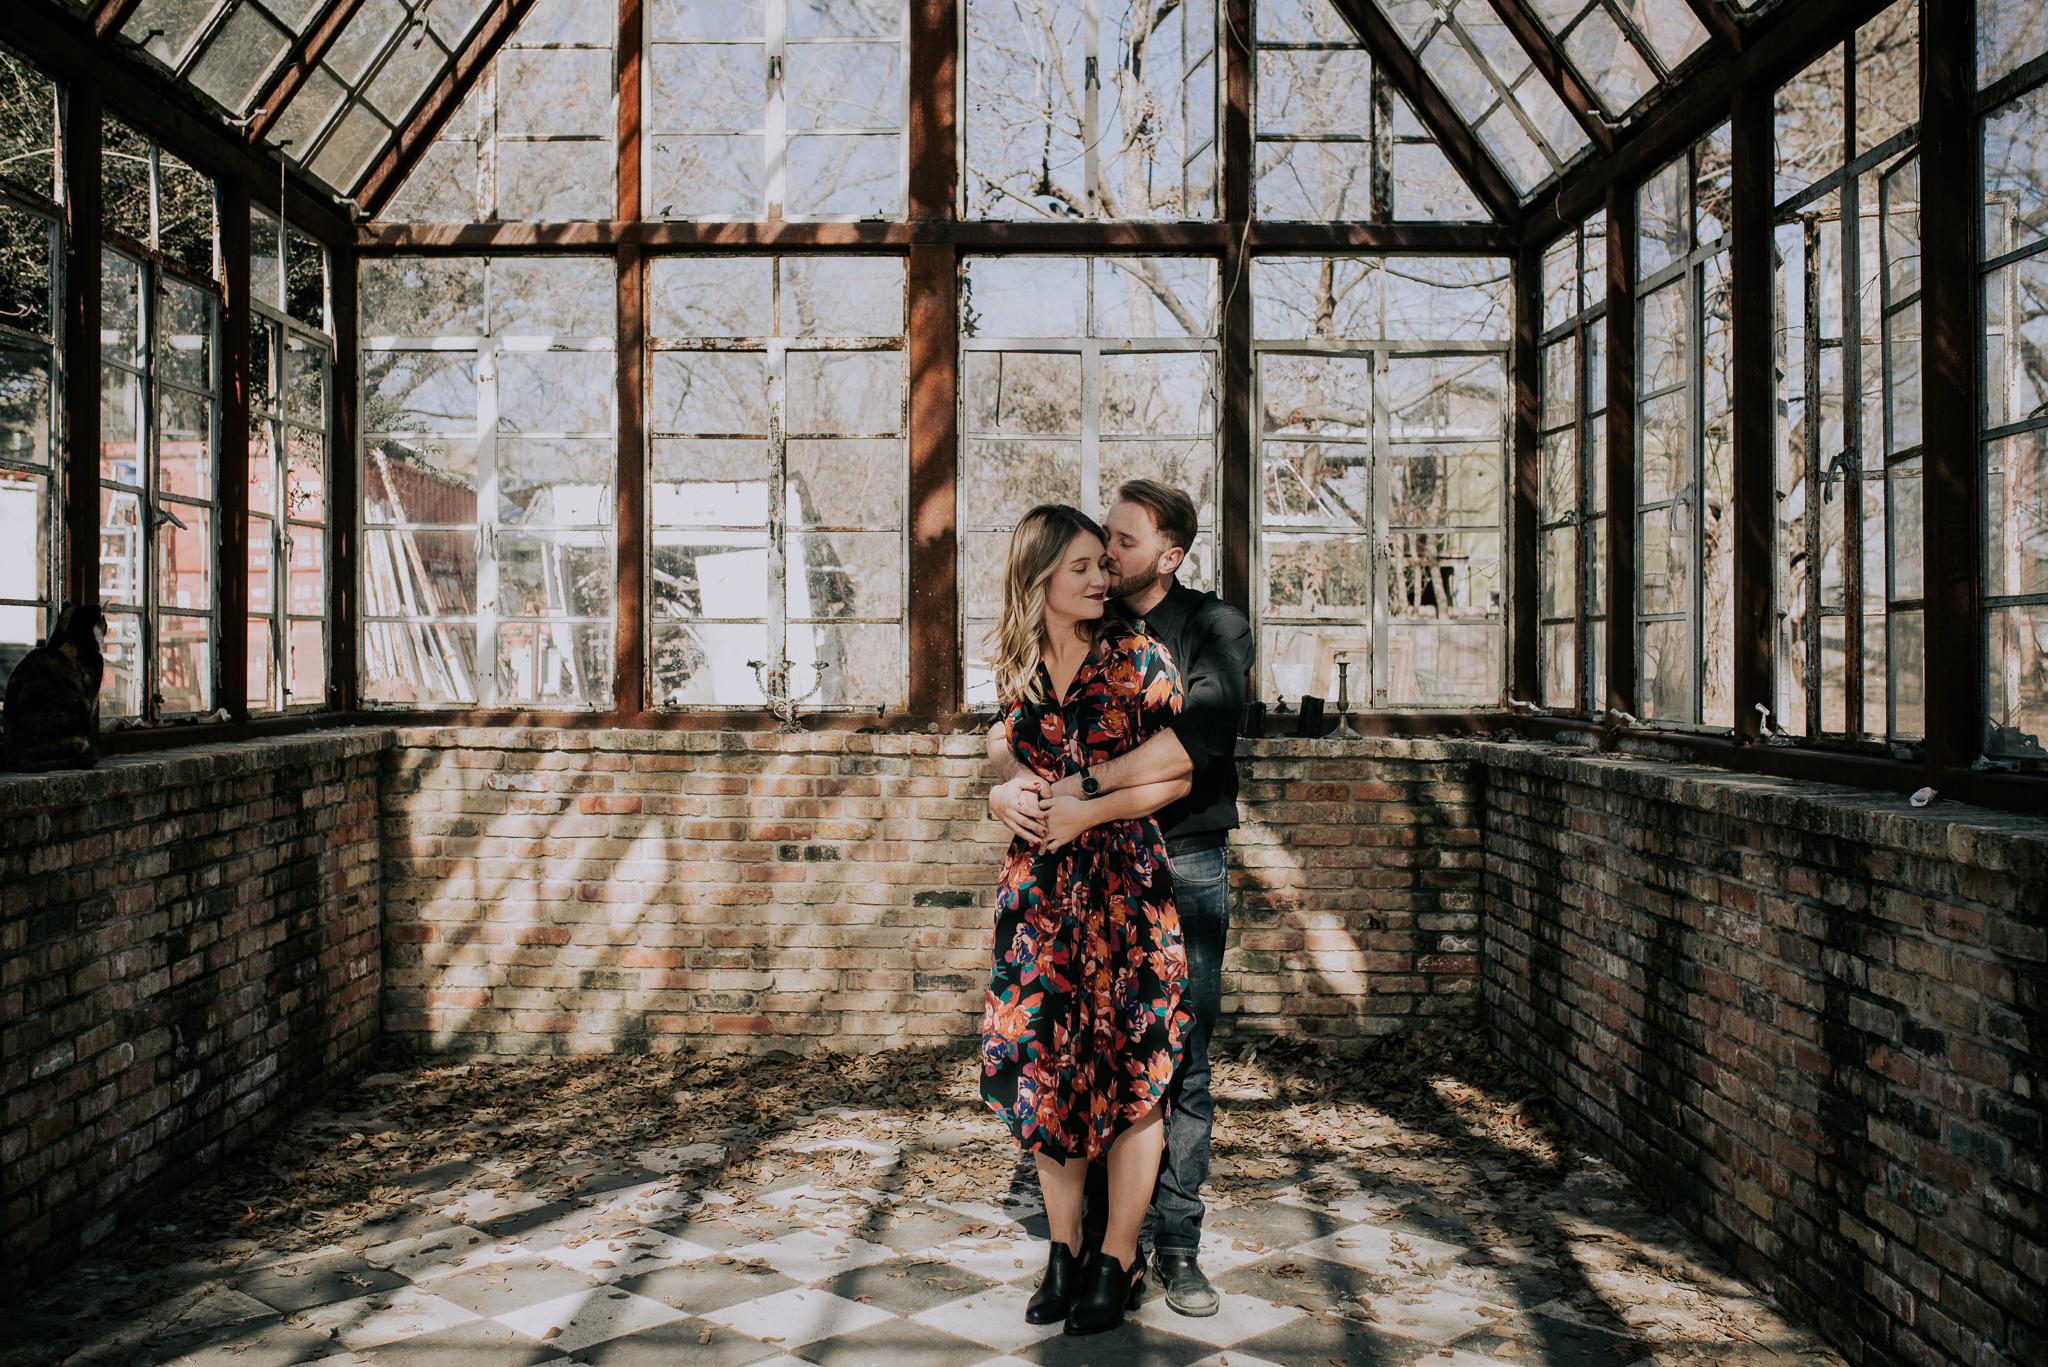 kristen giles photography   texas-wedding-elopement-photographer-sekrit theater-austin-engagement-10-blog.jpg